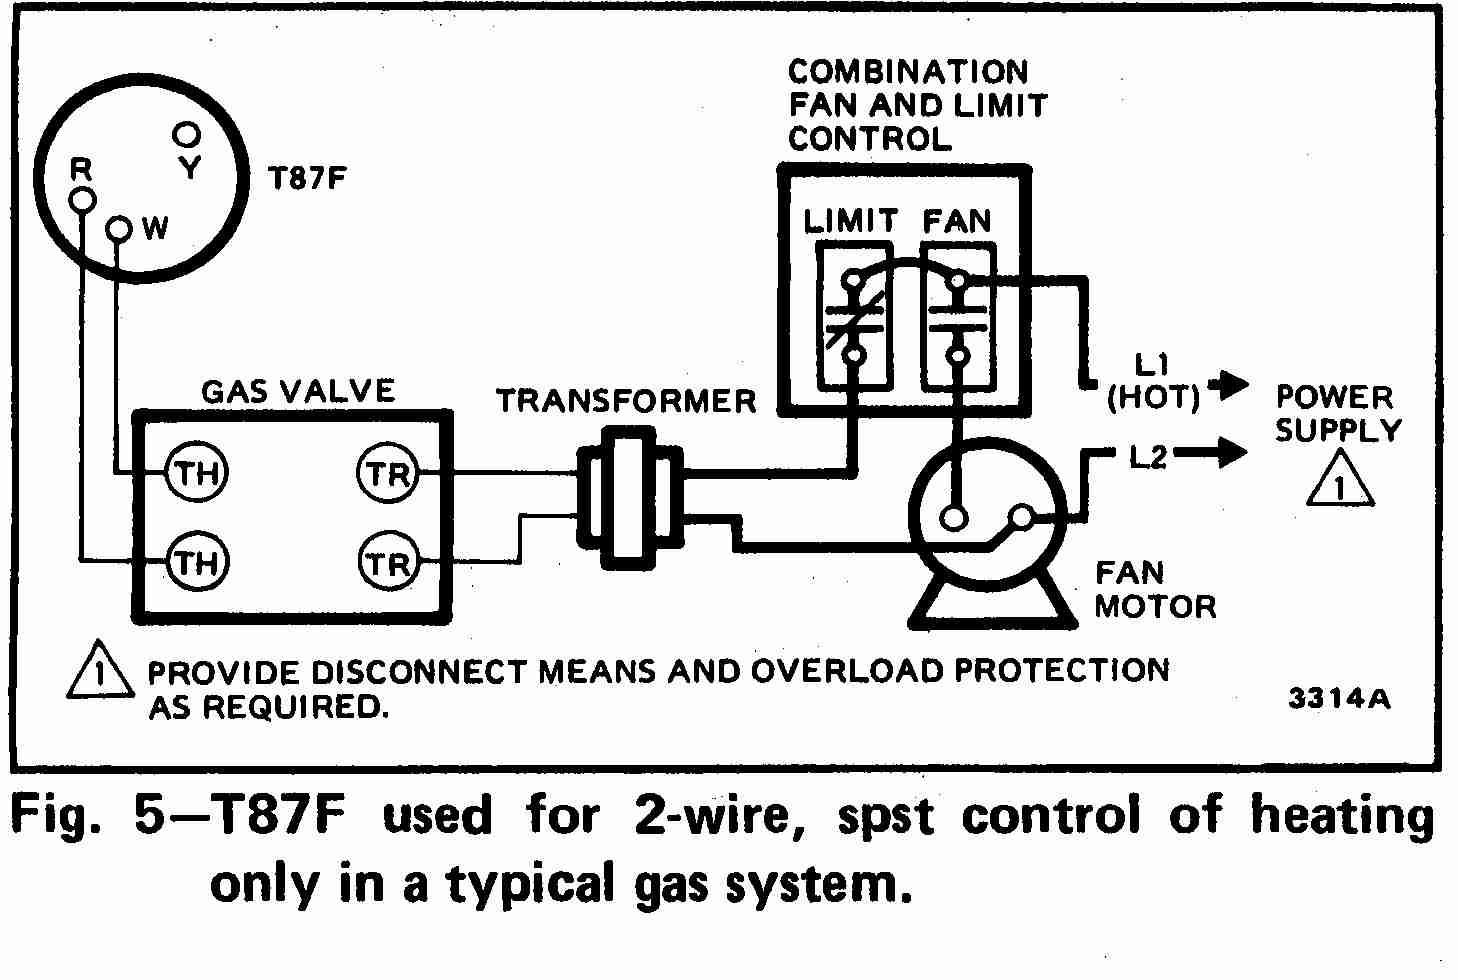 TT_T87F_0002_2Wg_DJF?resize=665%2C447 totaline thermostat wiring diagram p474 wiring diagram totaline p474 0100 wiring diagram at mr168.co